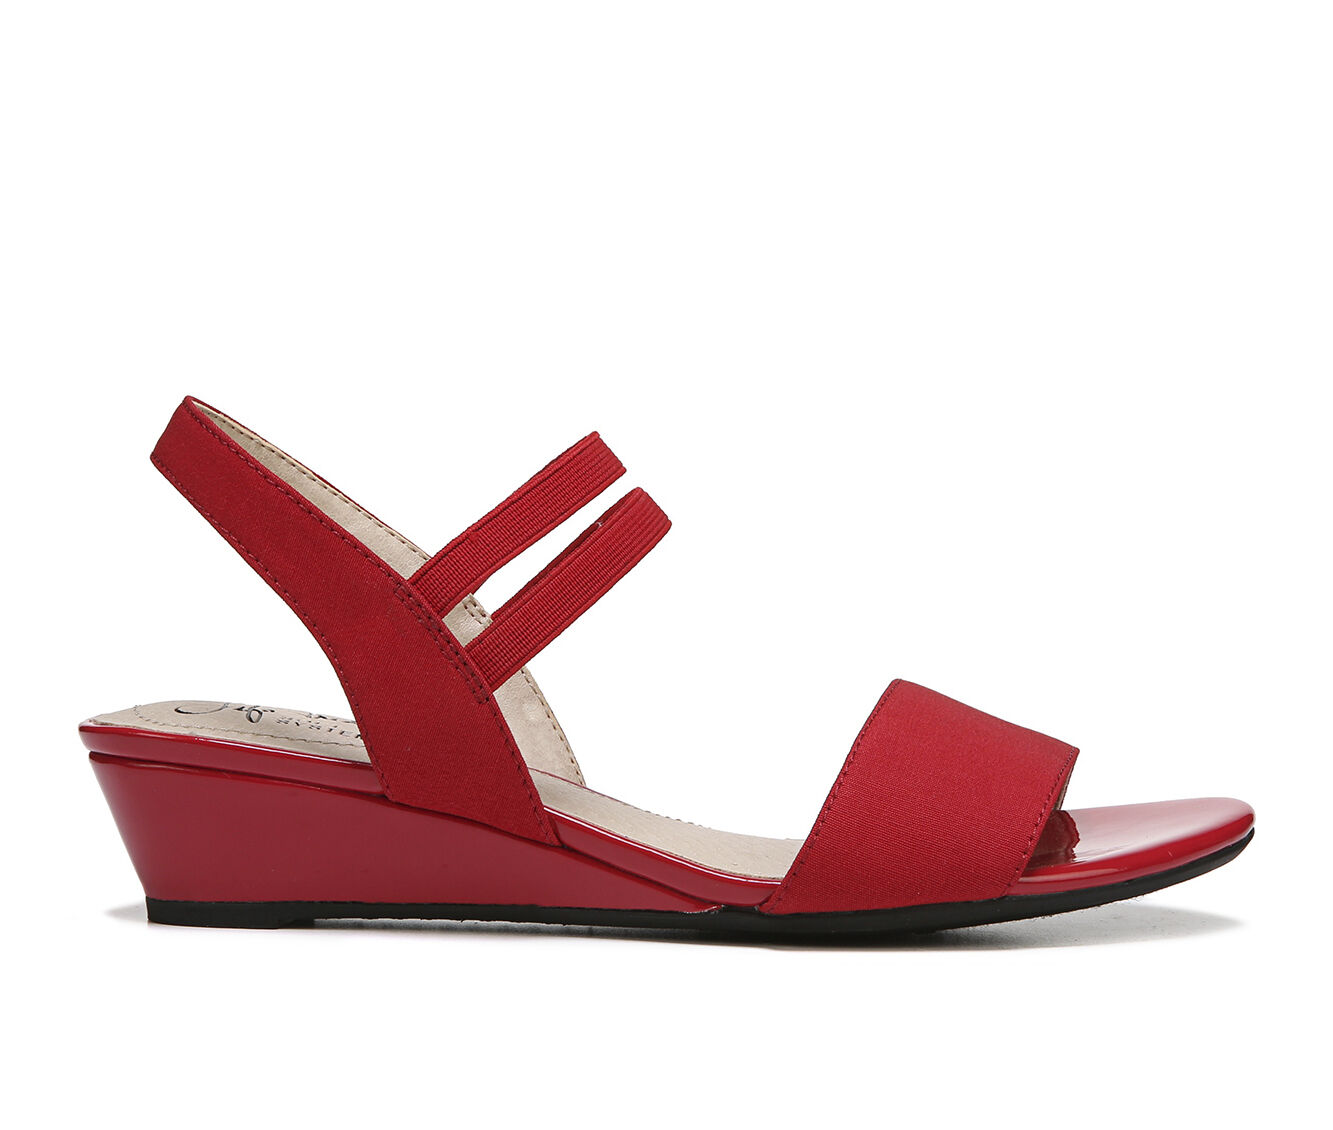 Women's LifeStride Yolo Wedge Sandals Red